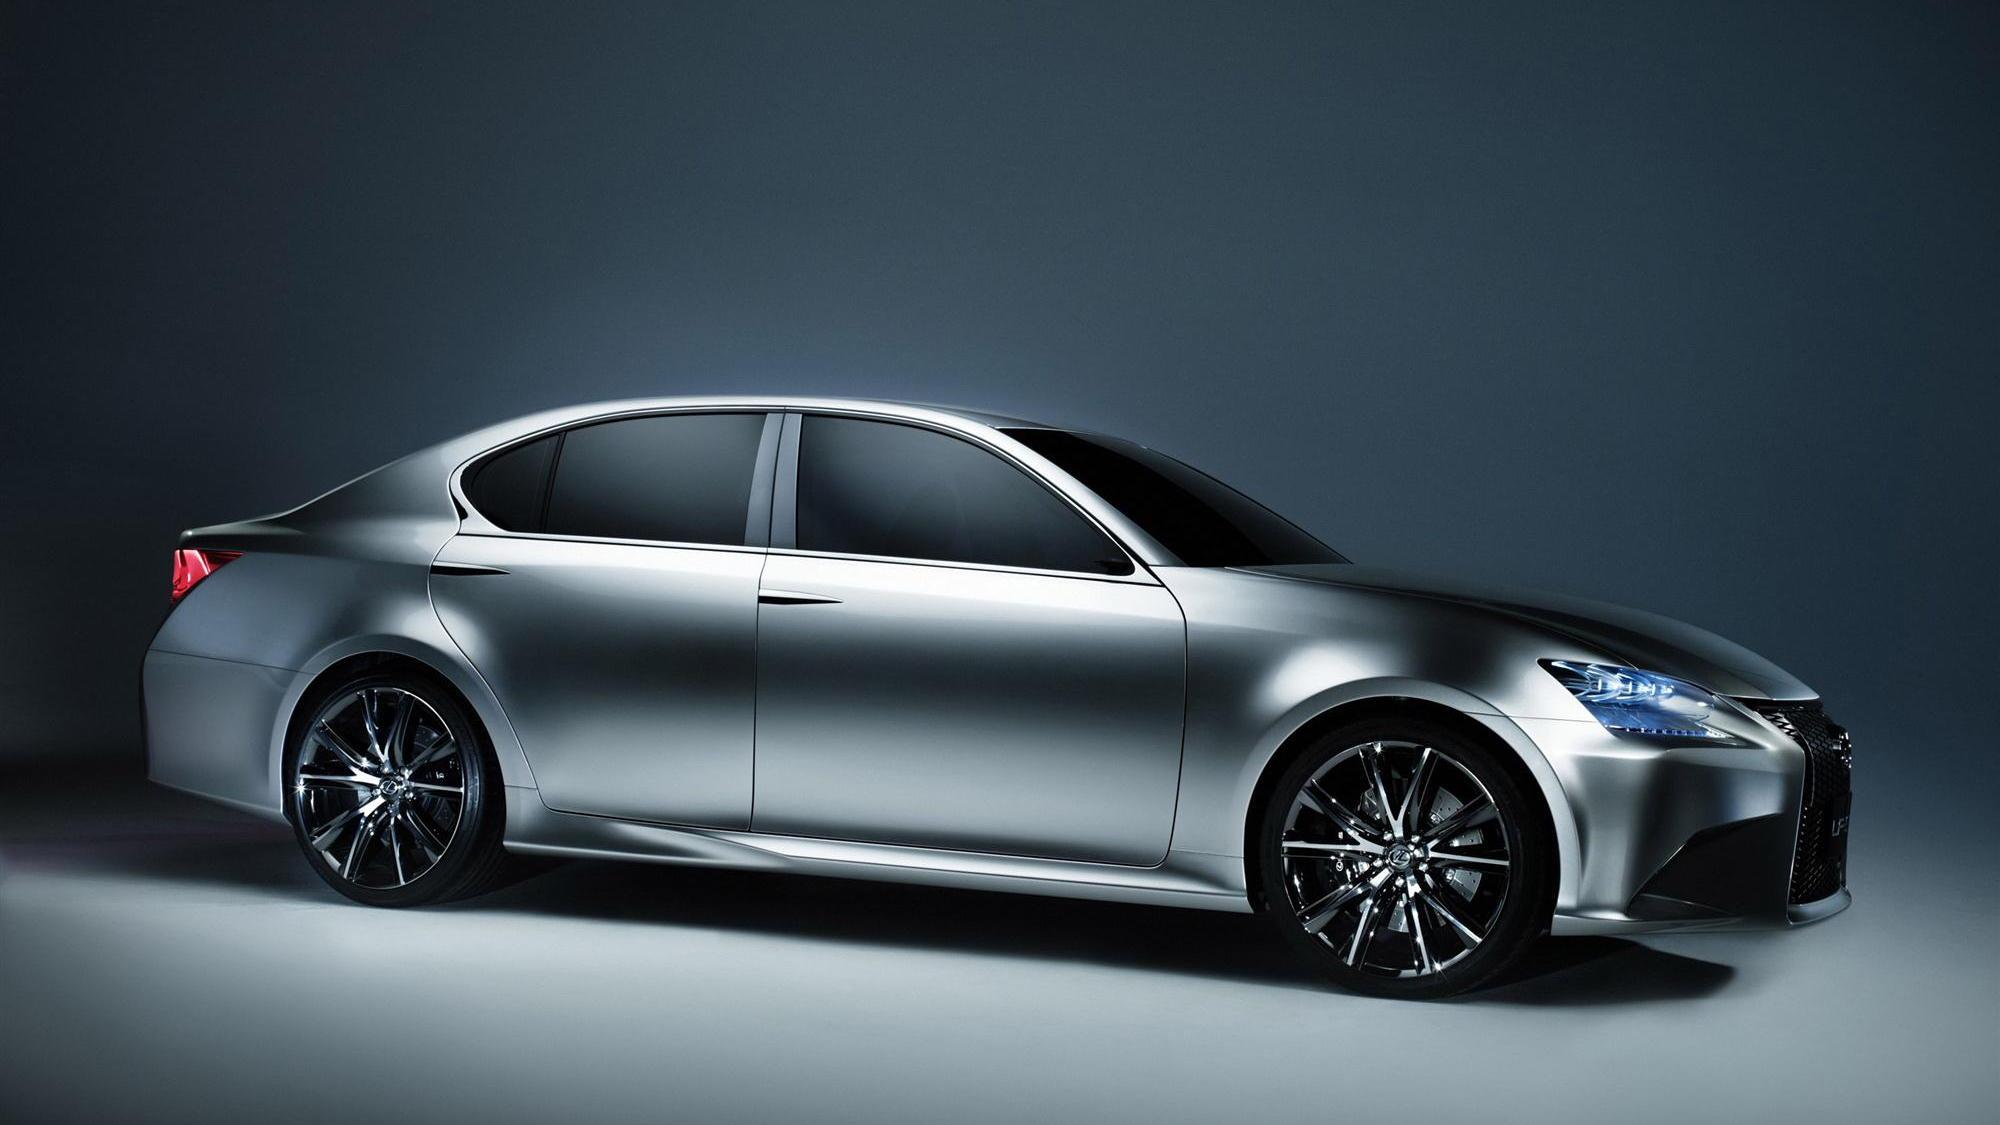 Lexus LF-Gh Hybrid Concept